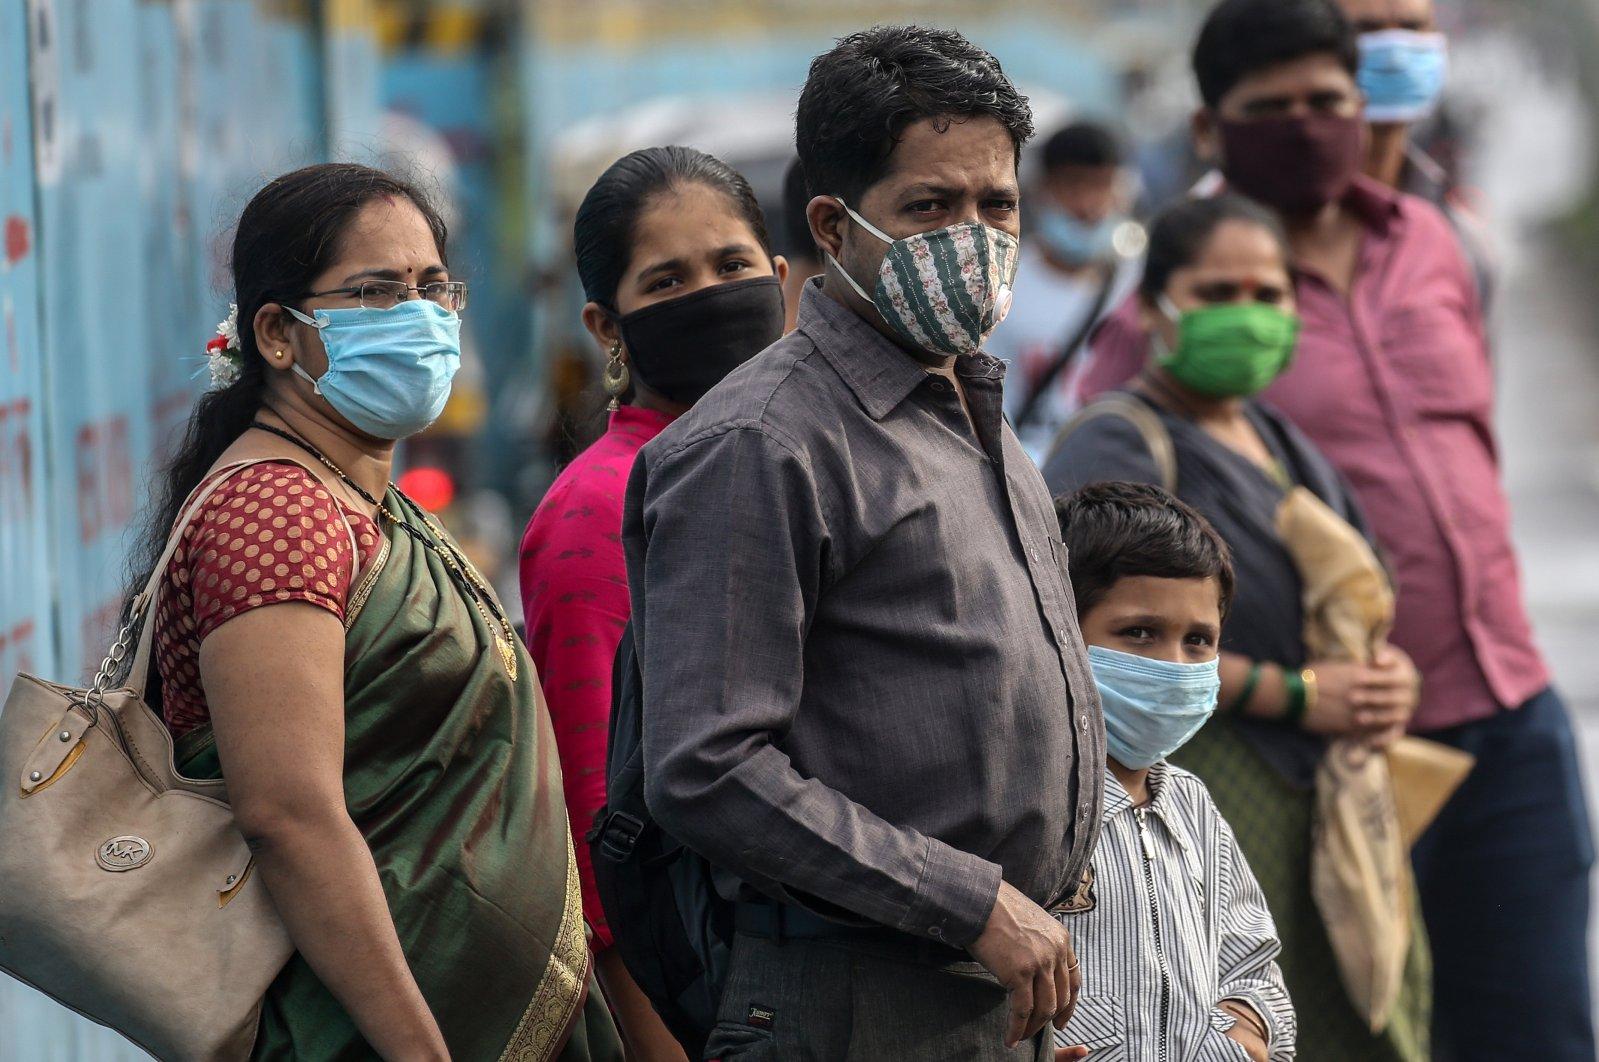 Indian people wearing protective masks wait at bus stop in Mumbai, India, Aug. 23, 2020. (EPA Photo)